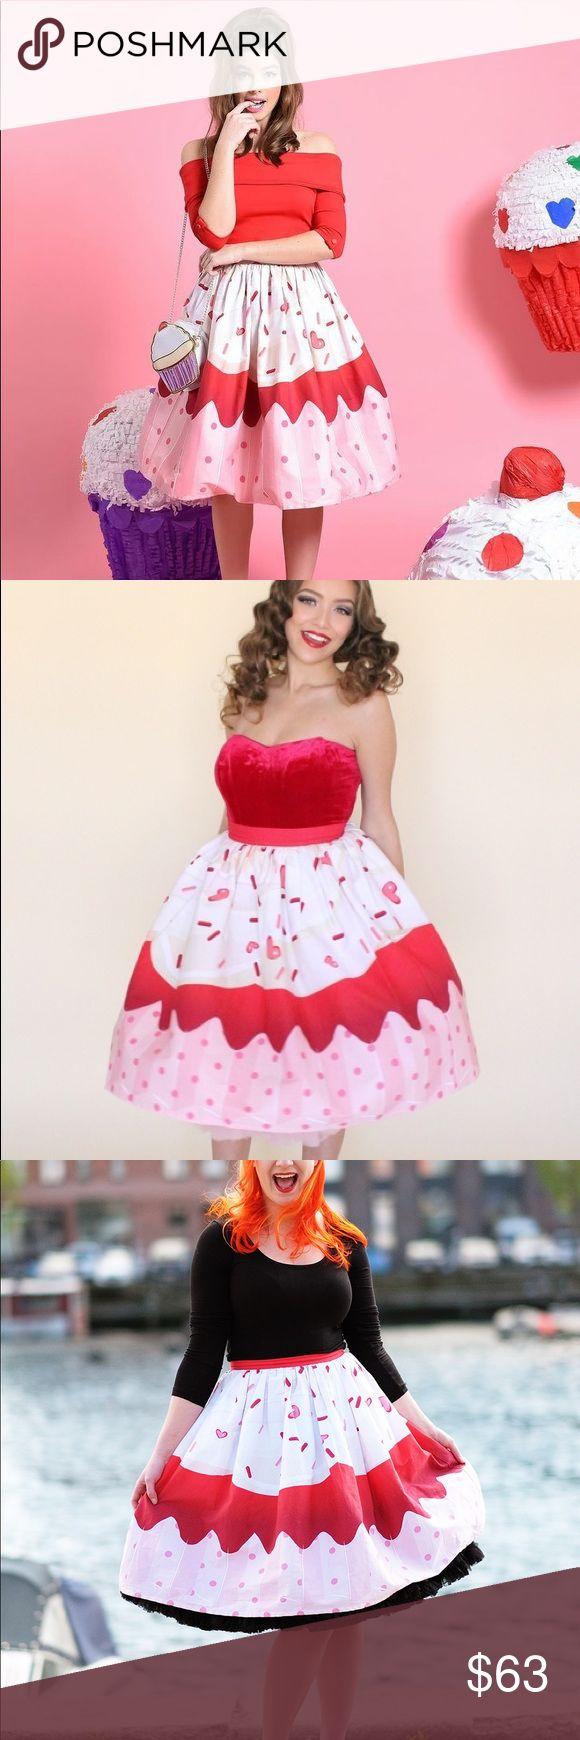 Pink Cupcake Sprinkles Kawaii Swing Skirt NWT. No trades. Price is firm. ModCloth Skirts Midi